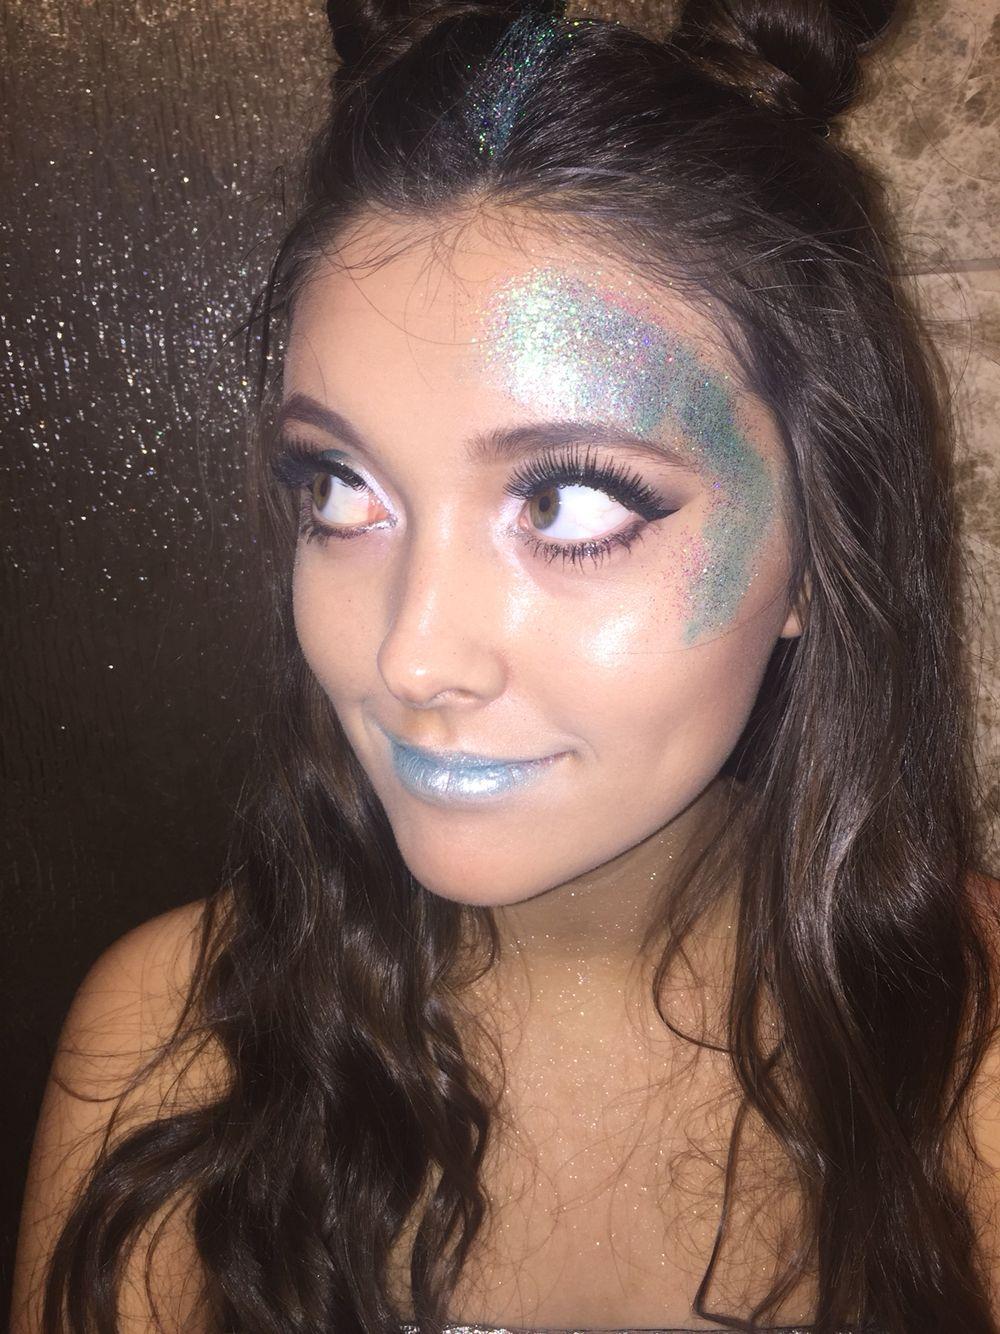 Alien makeup #halloween | Holidays! | Pinterest | Alien makeup ...